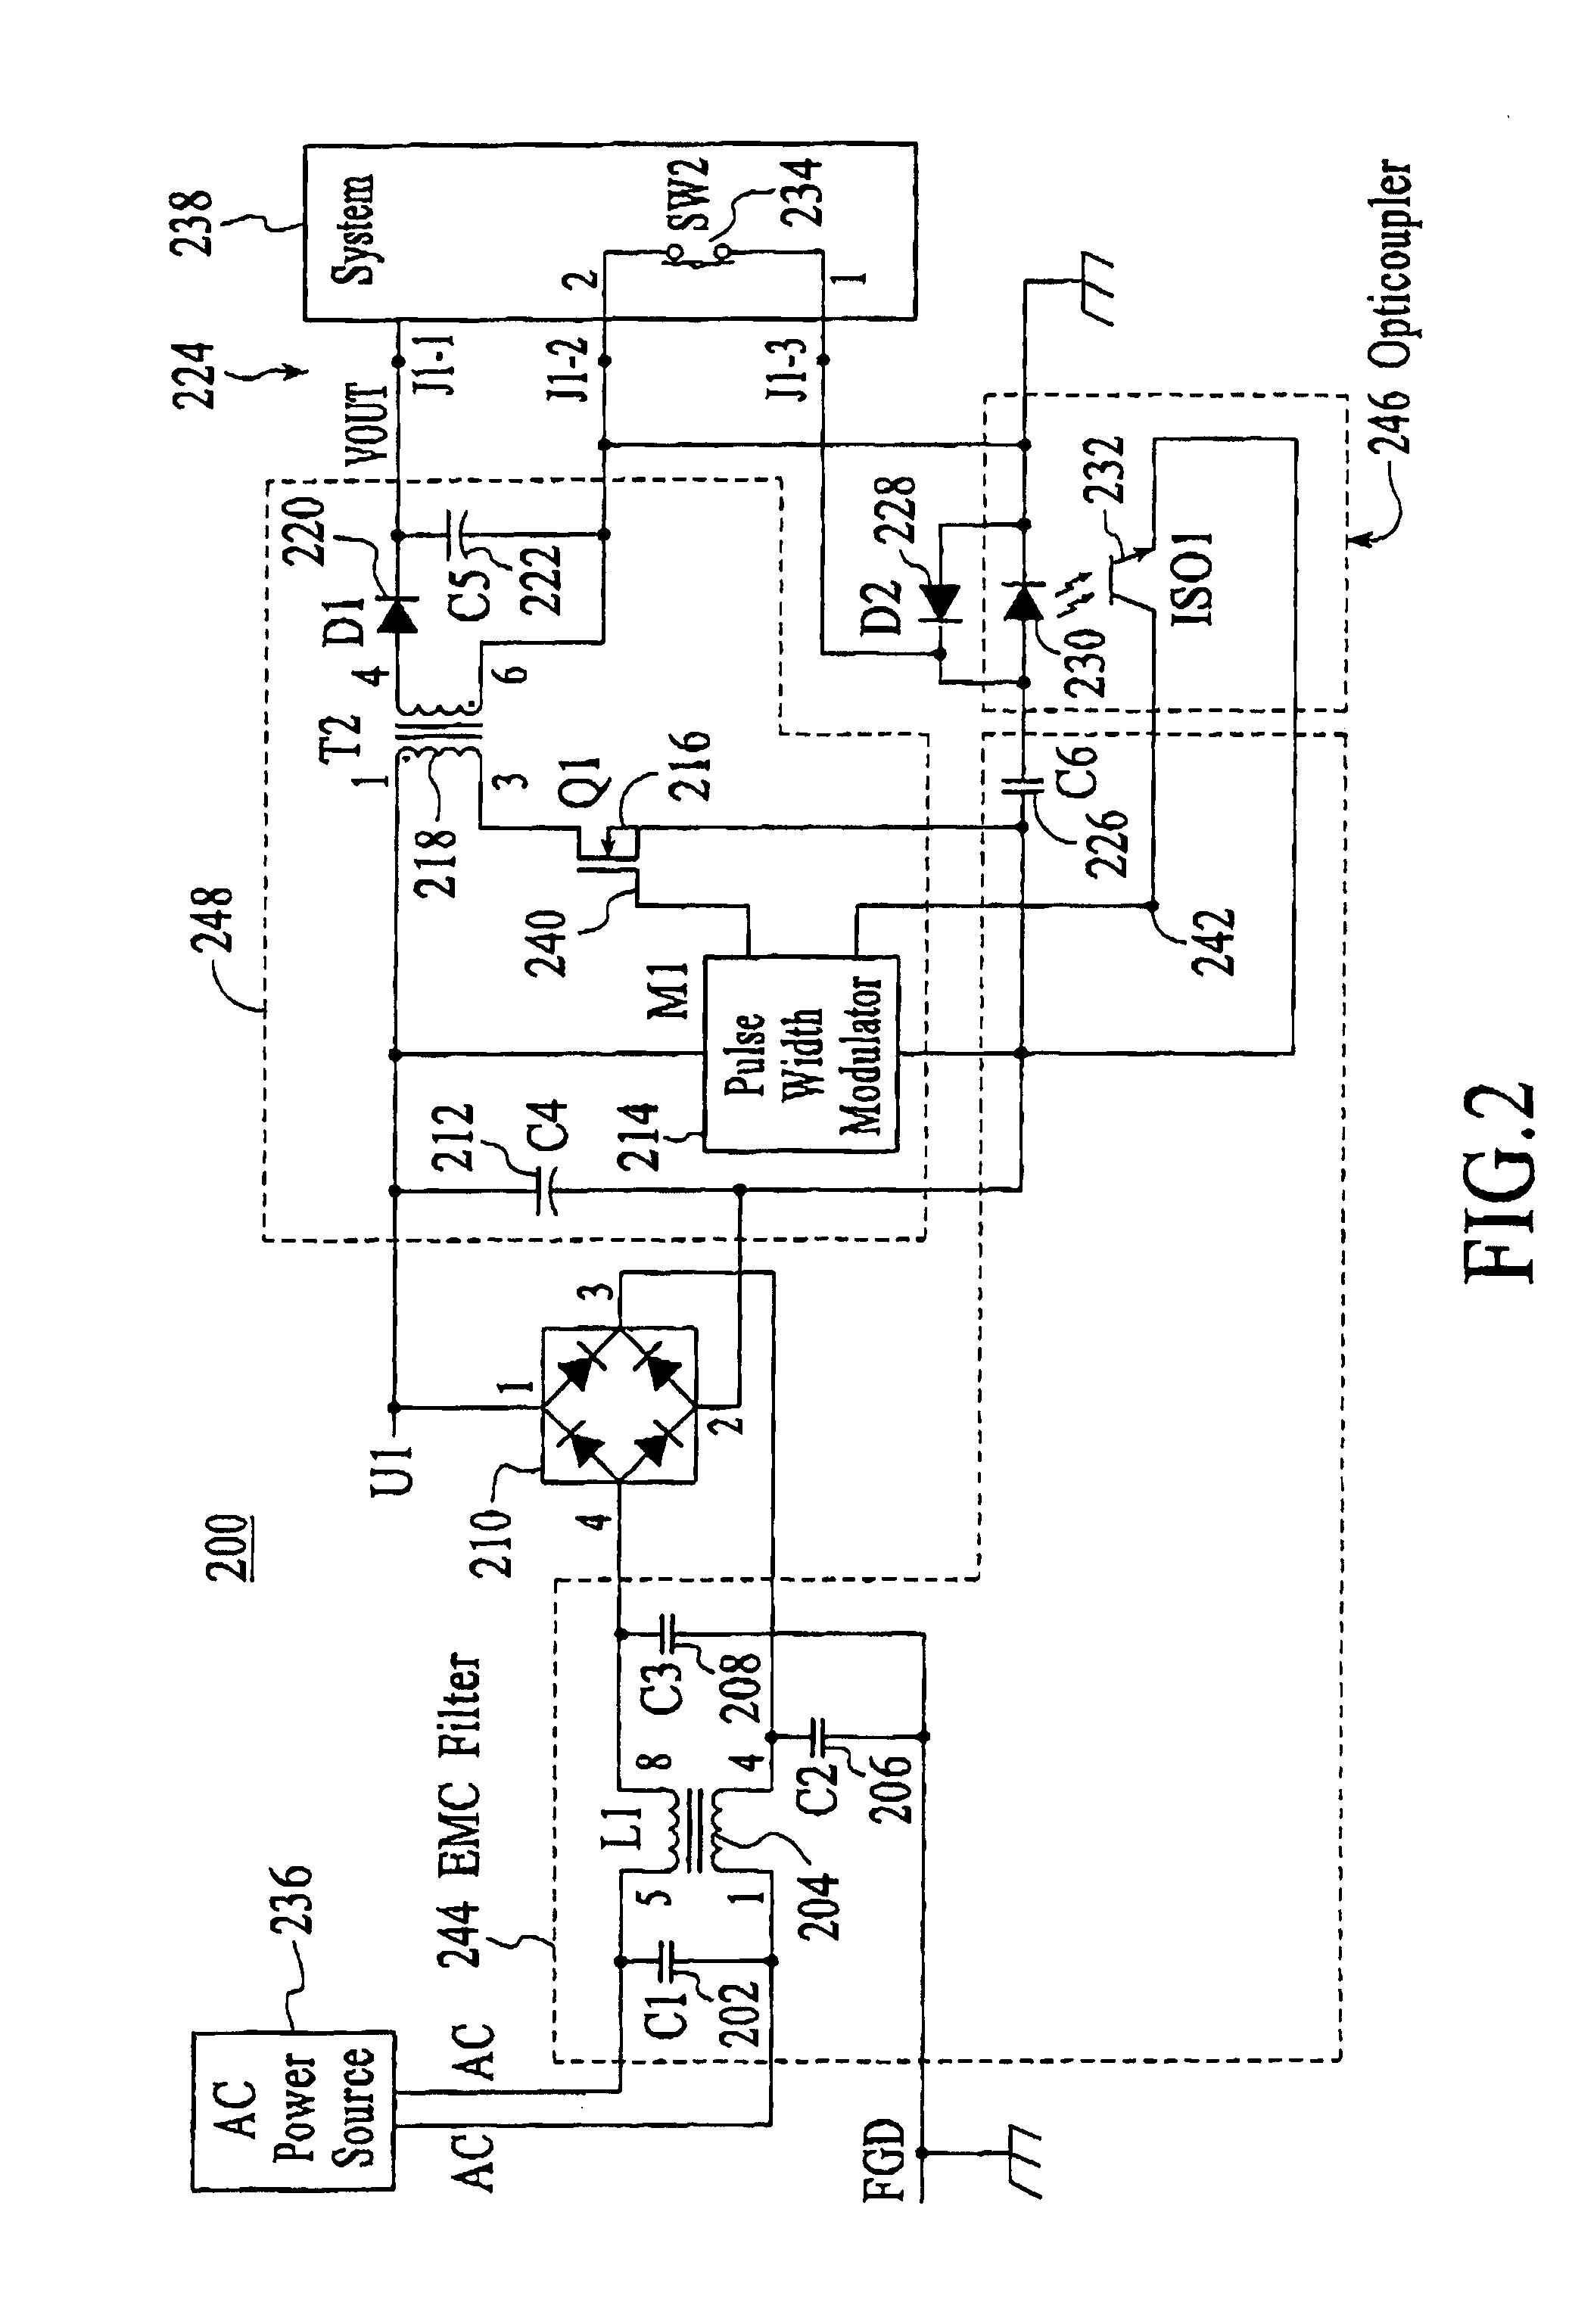 patente us6865094